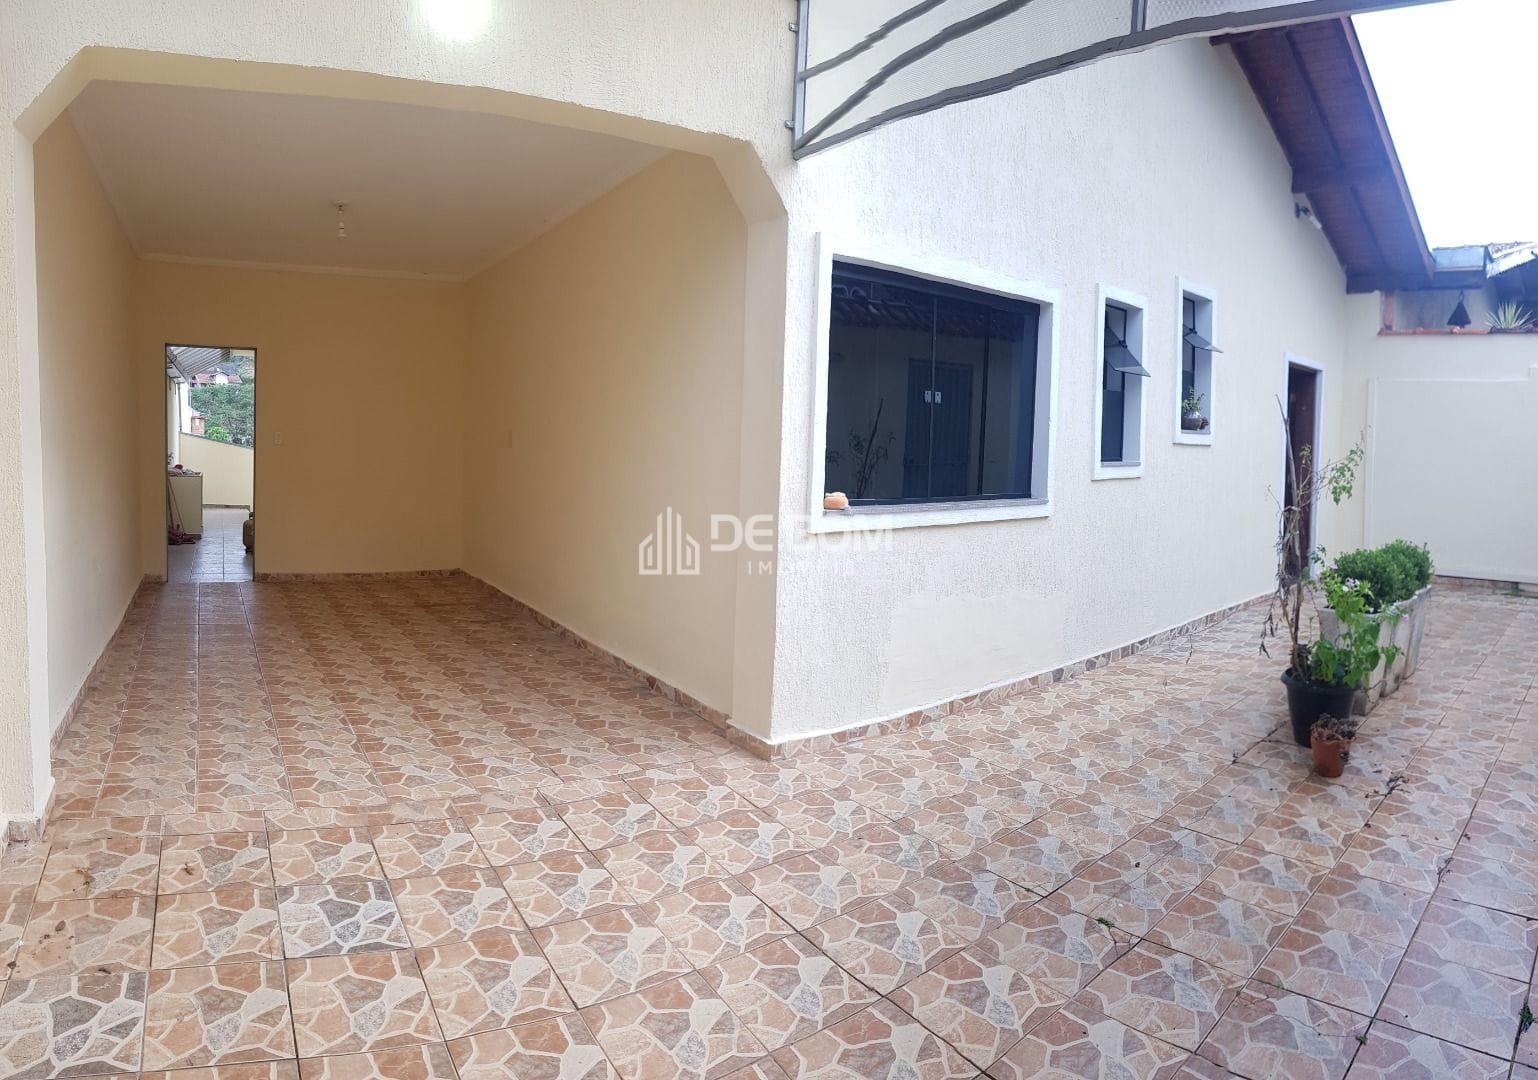 https://static.arboimoveis.com.br/CA0076_DEBOM/casa-santa-angela1626817653424klrql_watermark.jpg